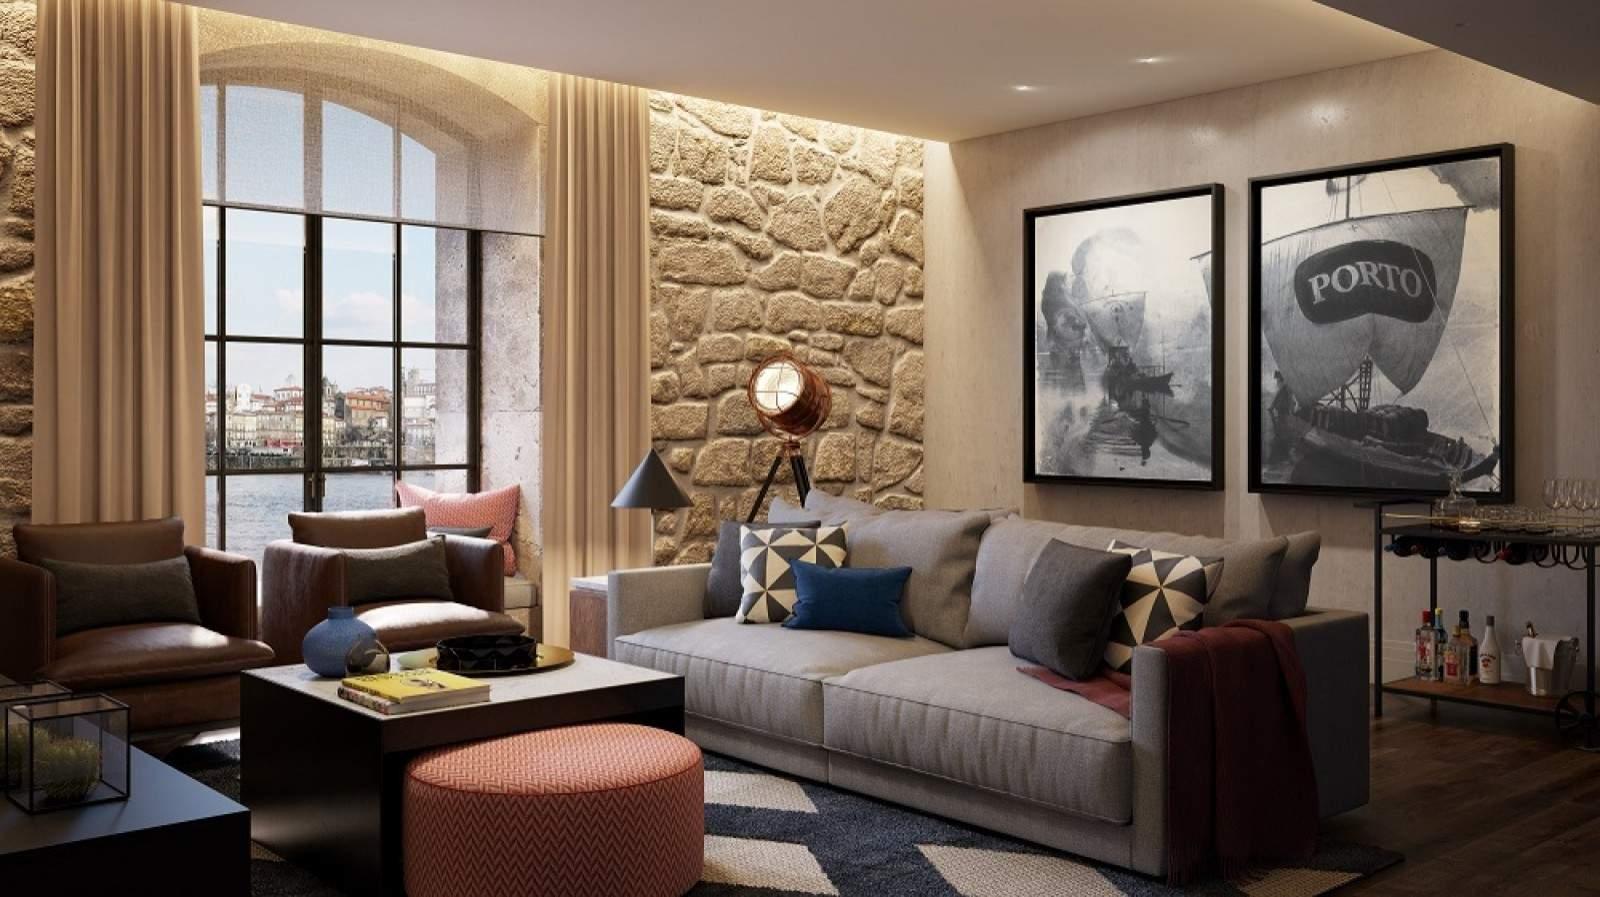 apartamento-novo-e-luxuoso-v-n-gaia-porto